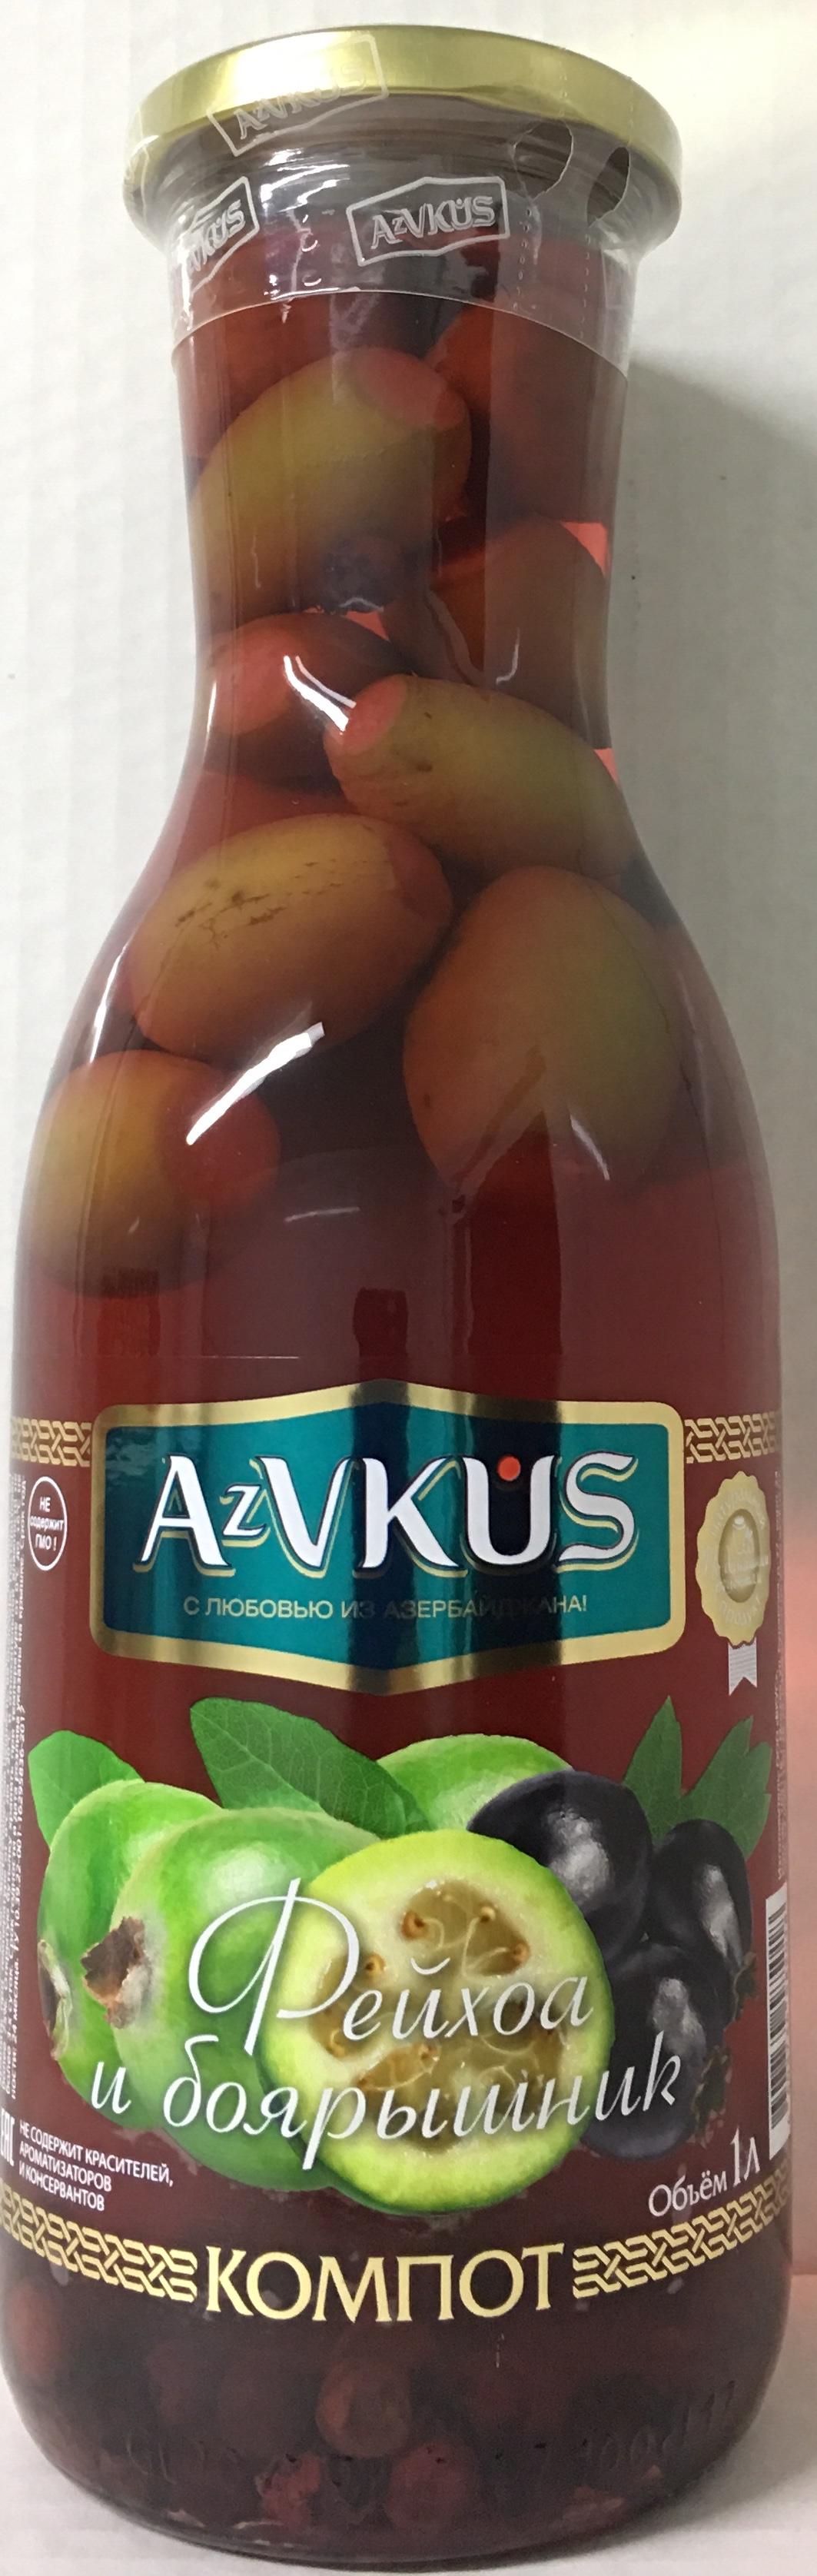 AZVKUS из фейхоа и боярышника 1л azvkus из фейхоа 1л